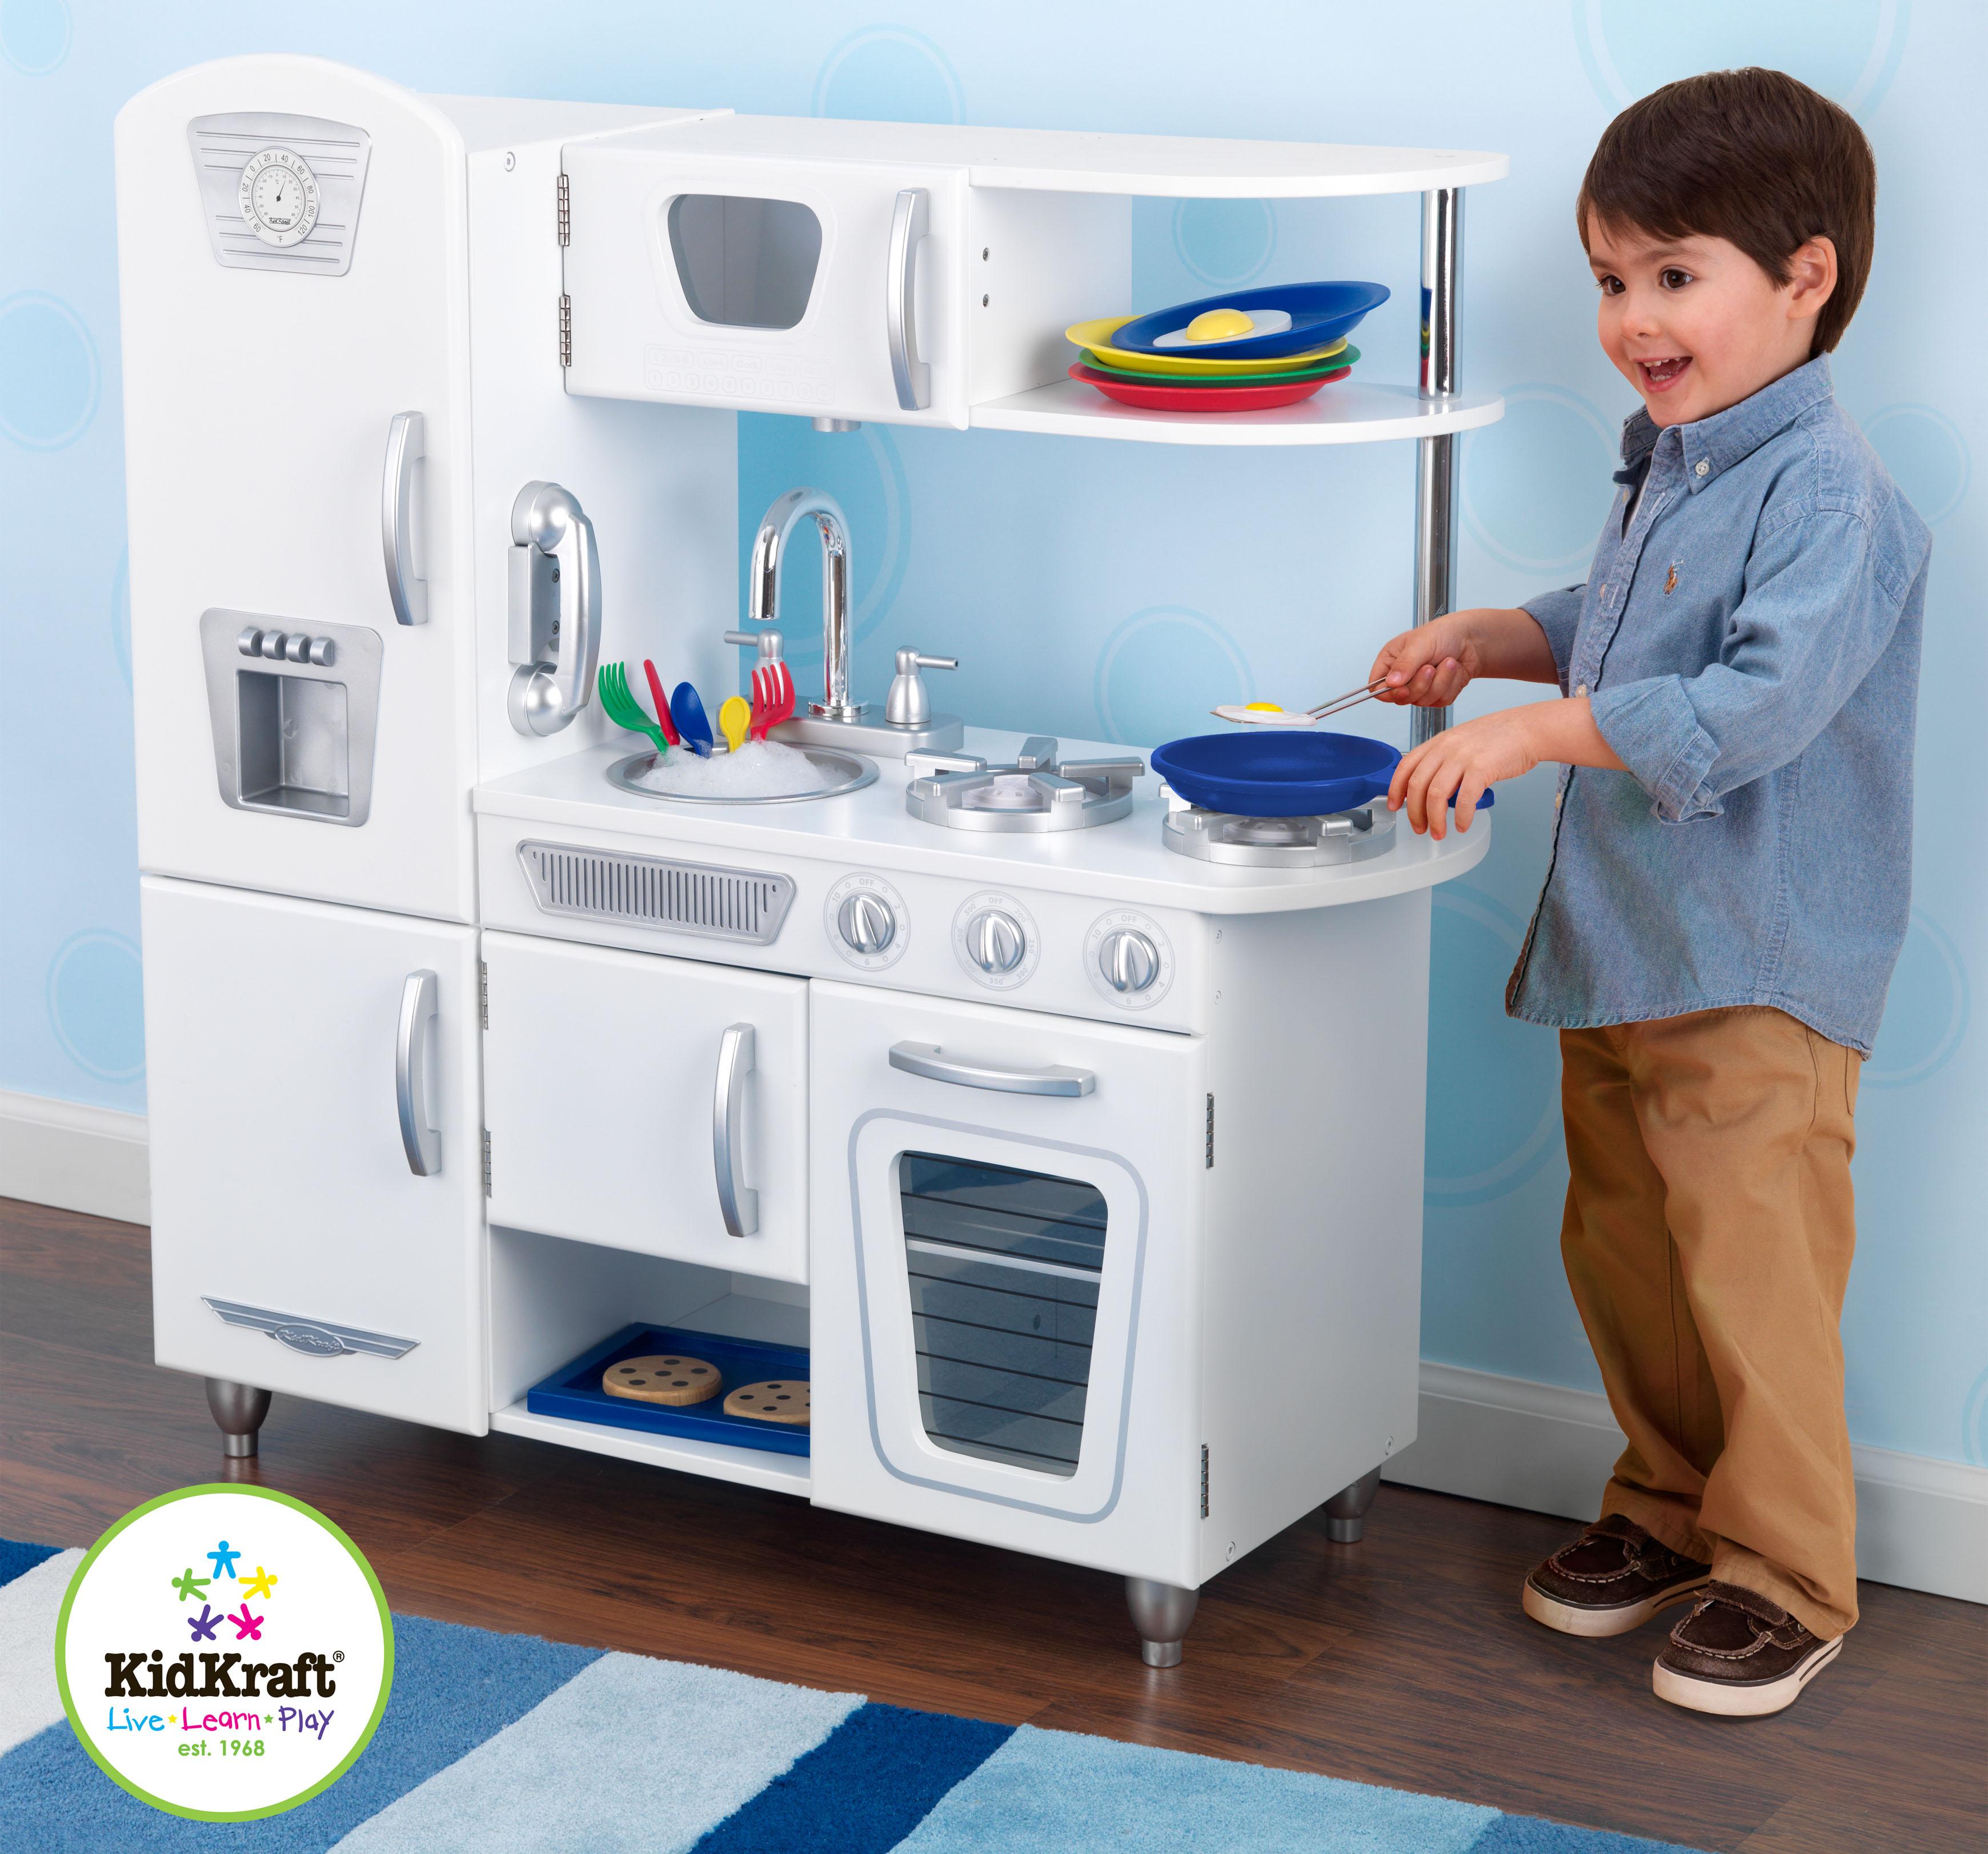 Dětská kuchyňka retro bílá